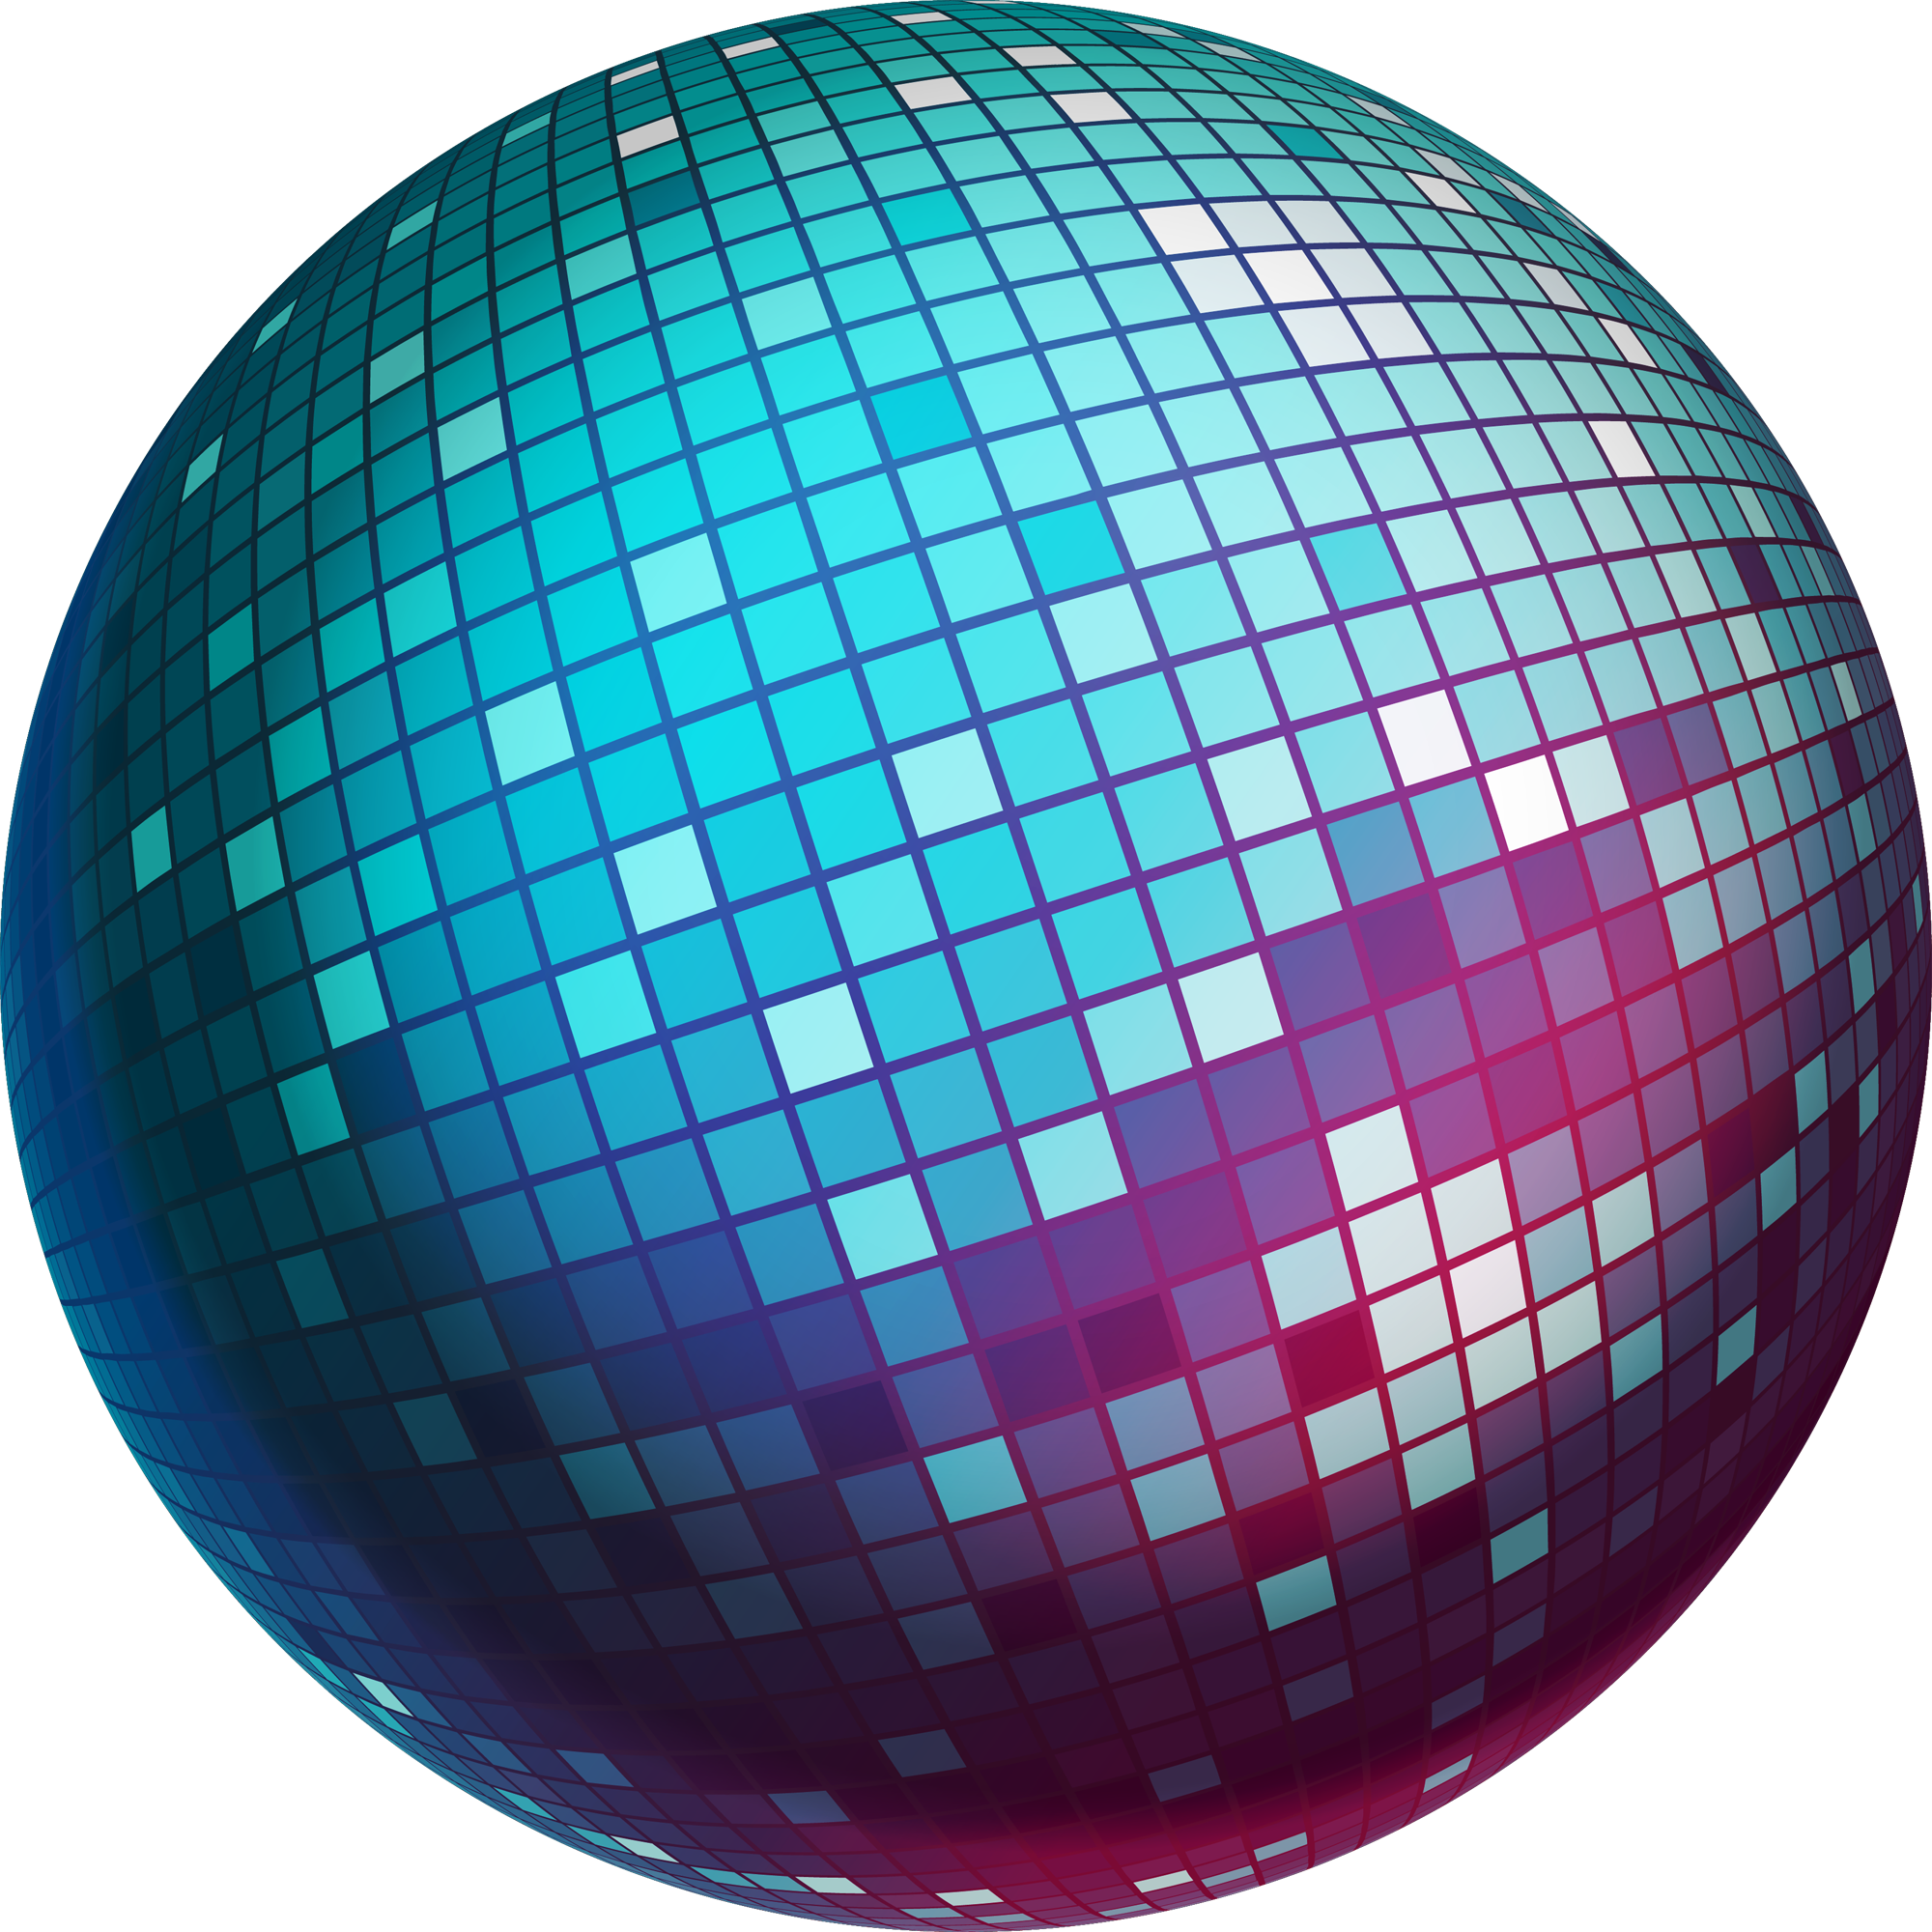 Disco clipart disco lights. Ball clip art transprent